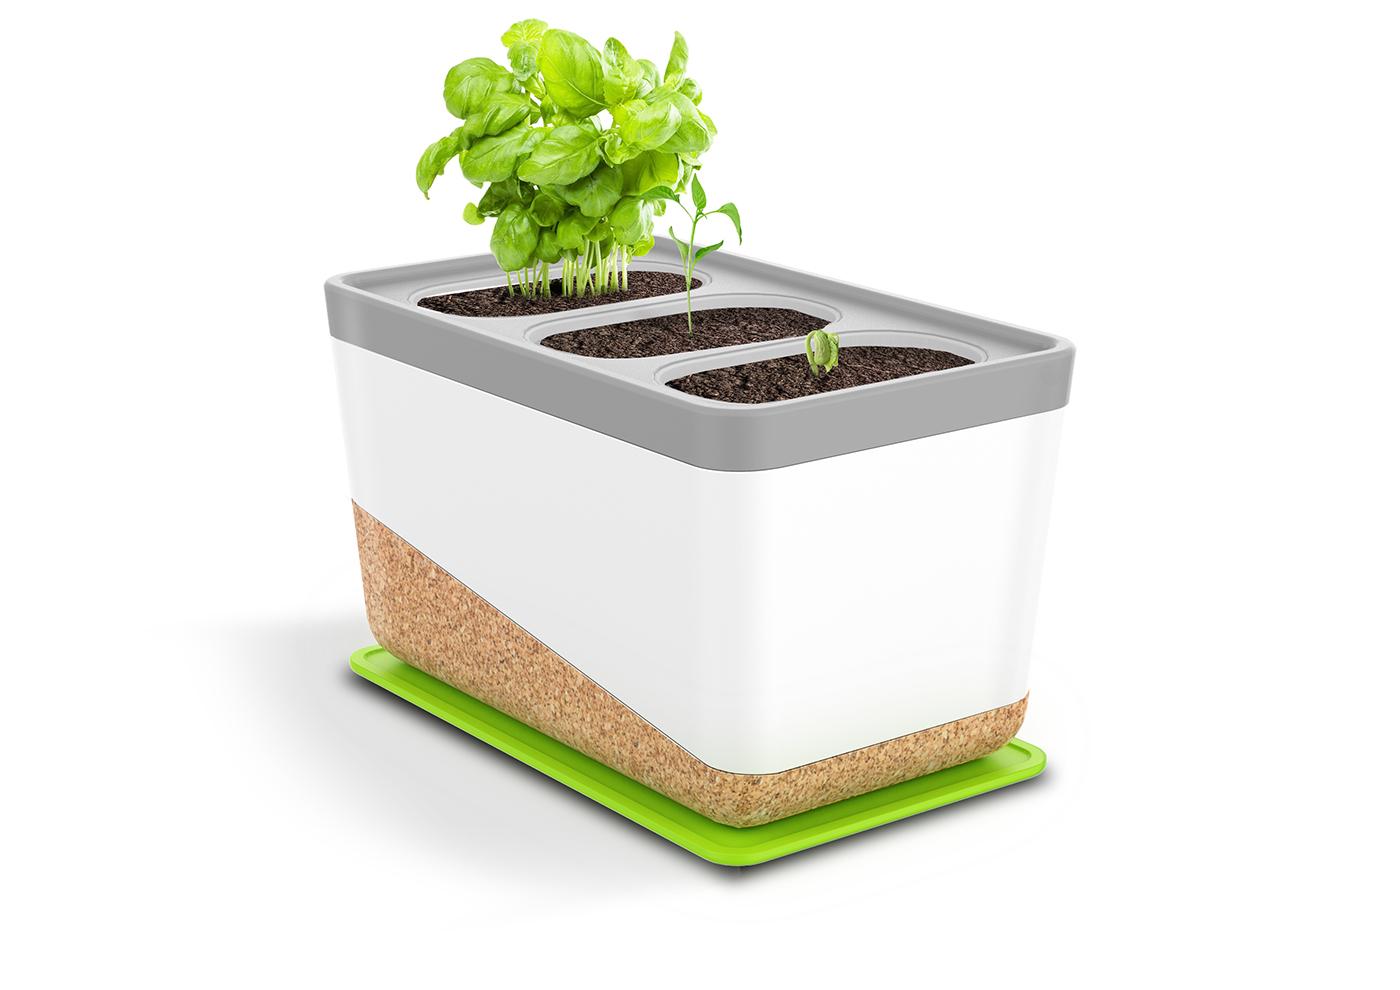 herb garden Coffee coffee waste urban living Home Garden plant pot Plant eco friendly Sustainable circular economy